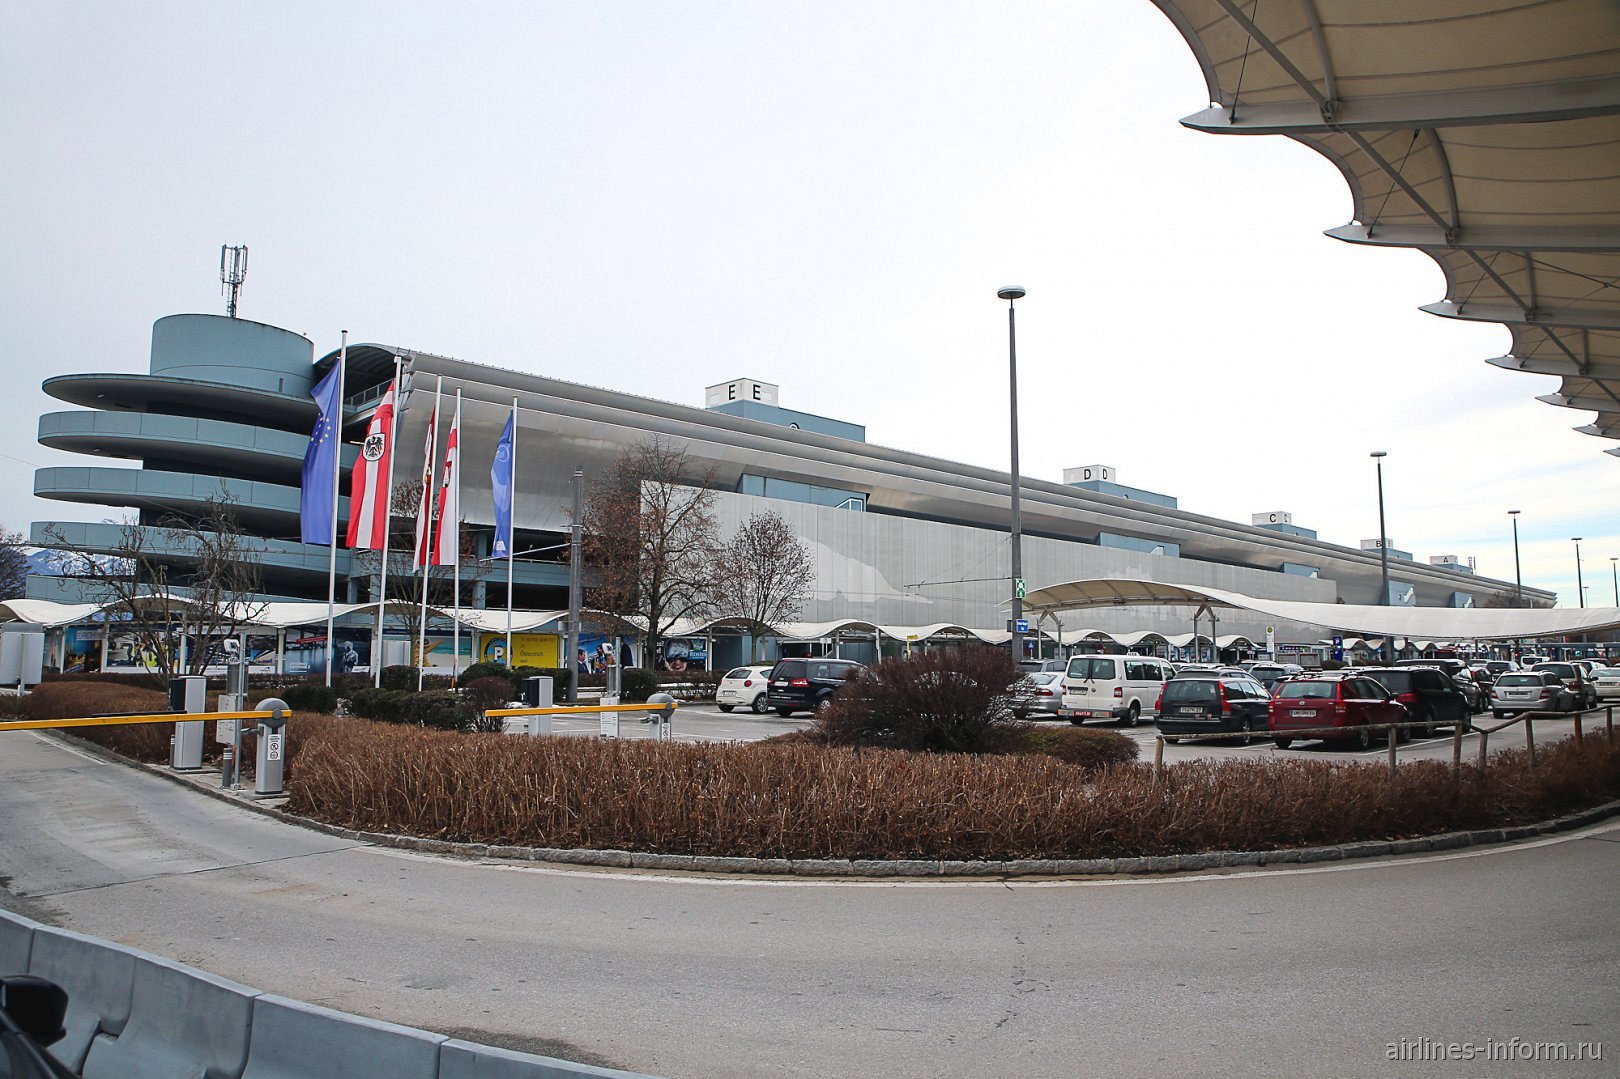 Автомобильная парковка в аэропорту Зальцбург